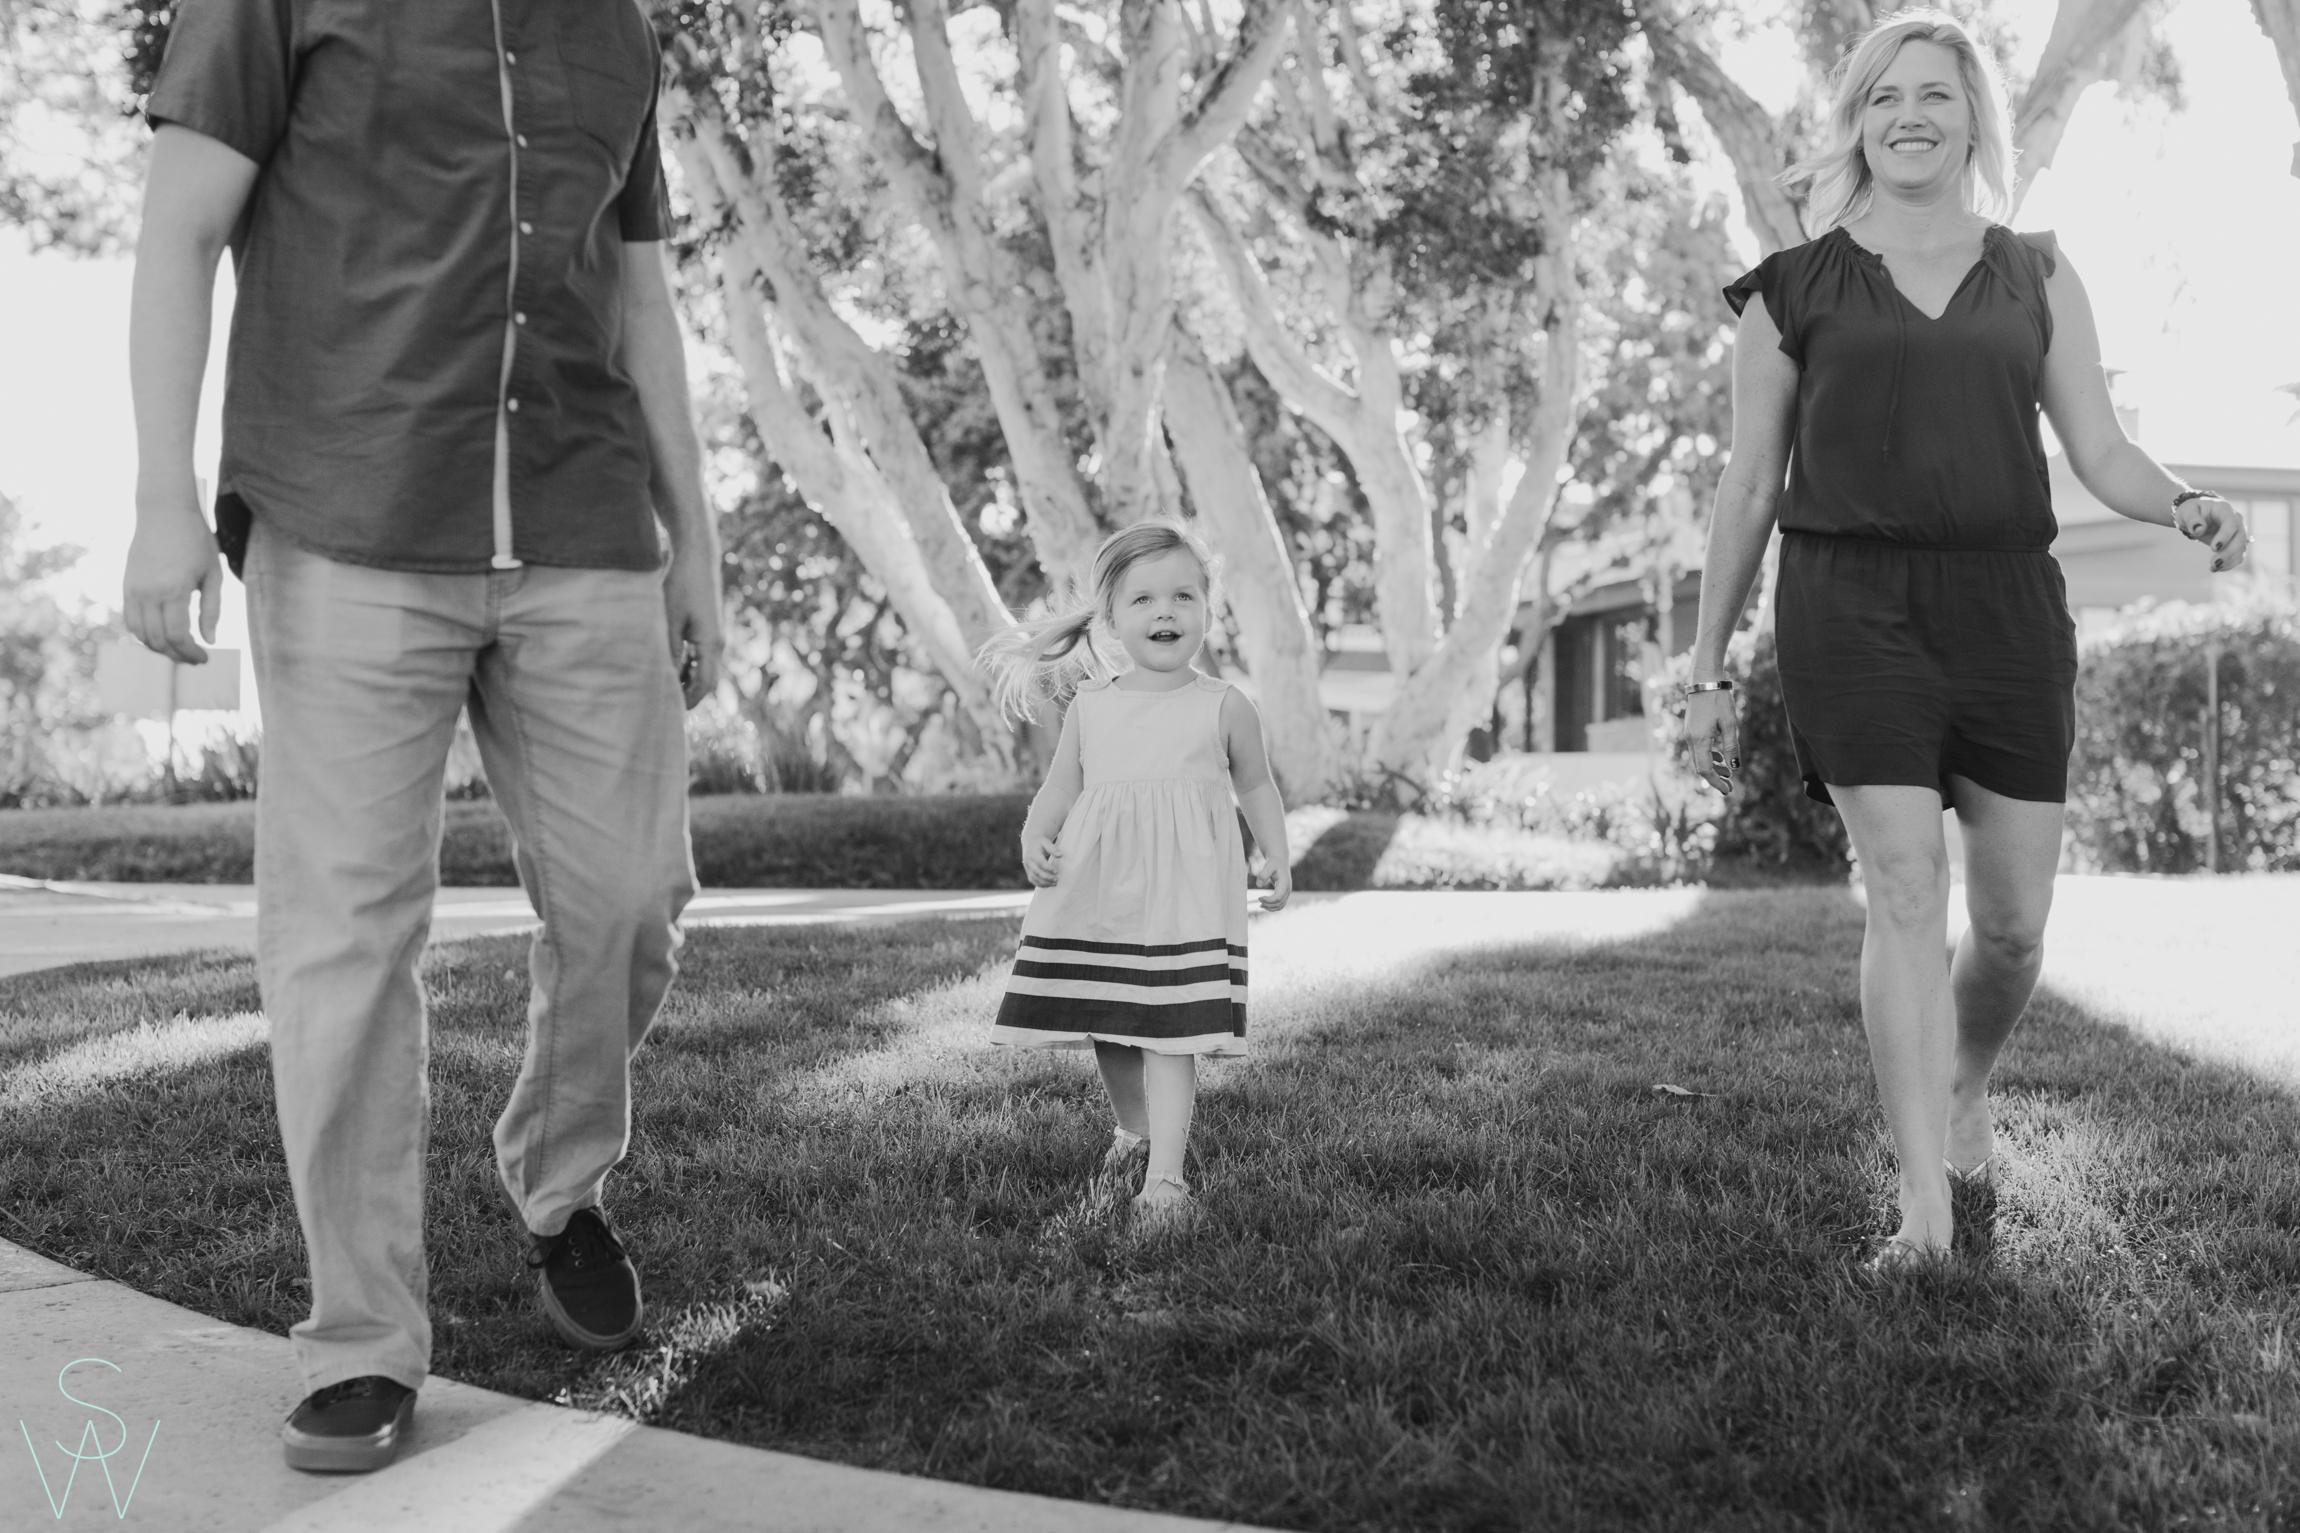 coronado.family.photography.shewanders-29.jpg